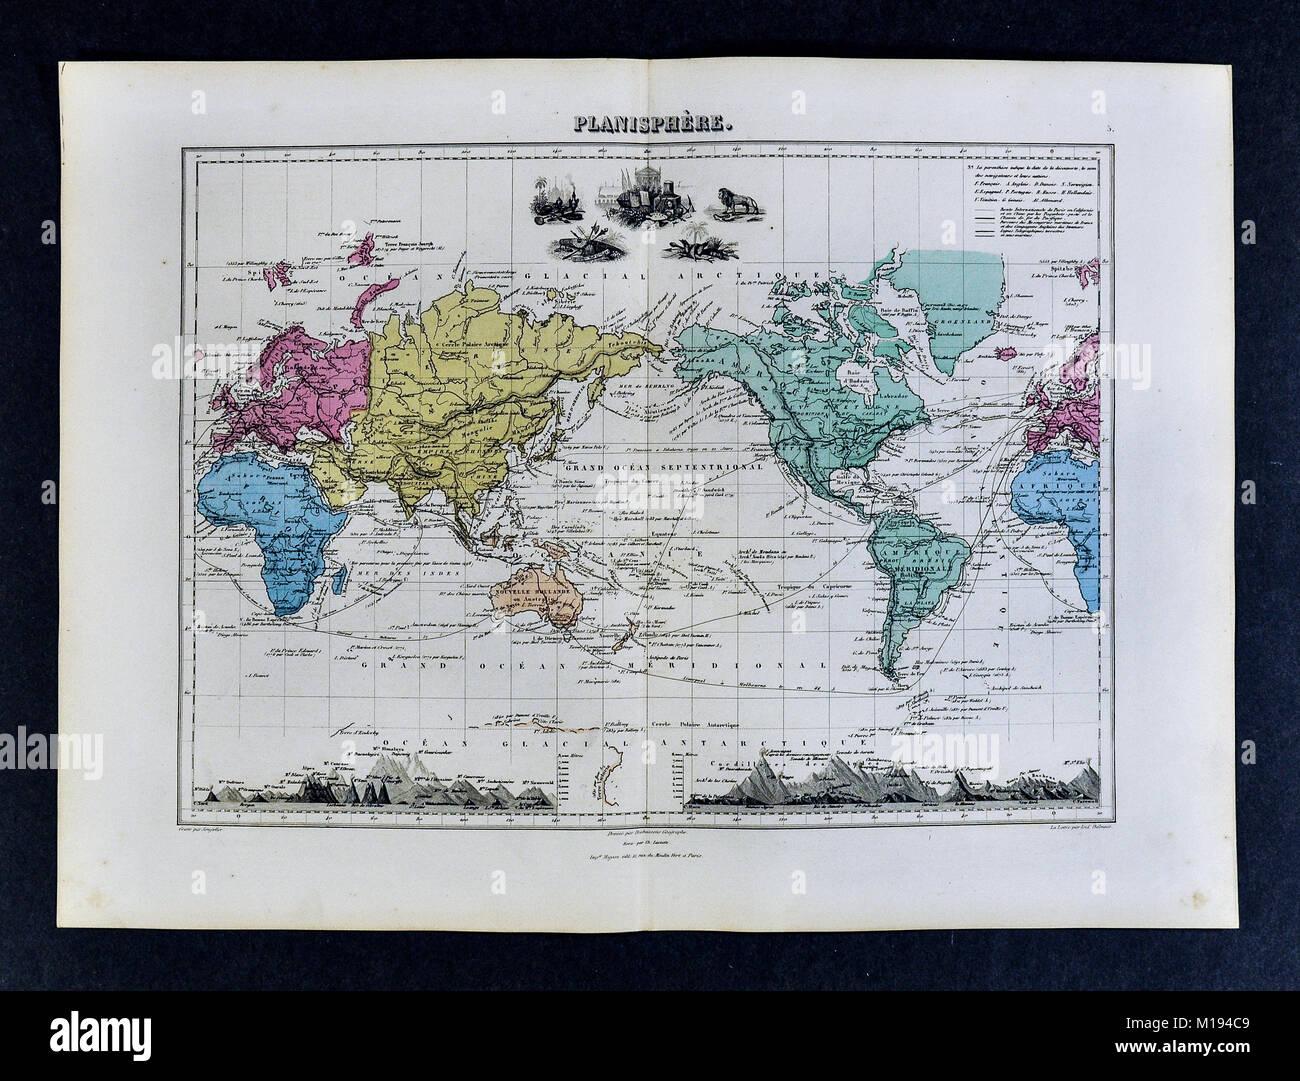 1877 Migeon Map - Stock Image